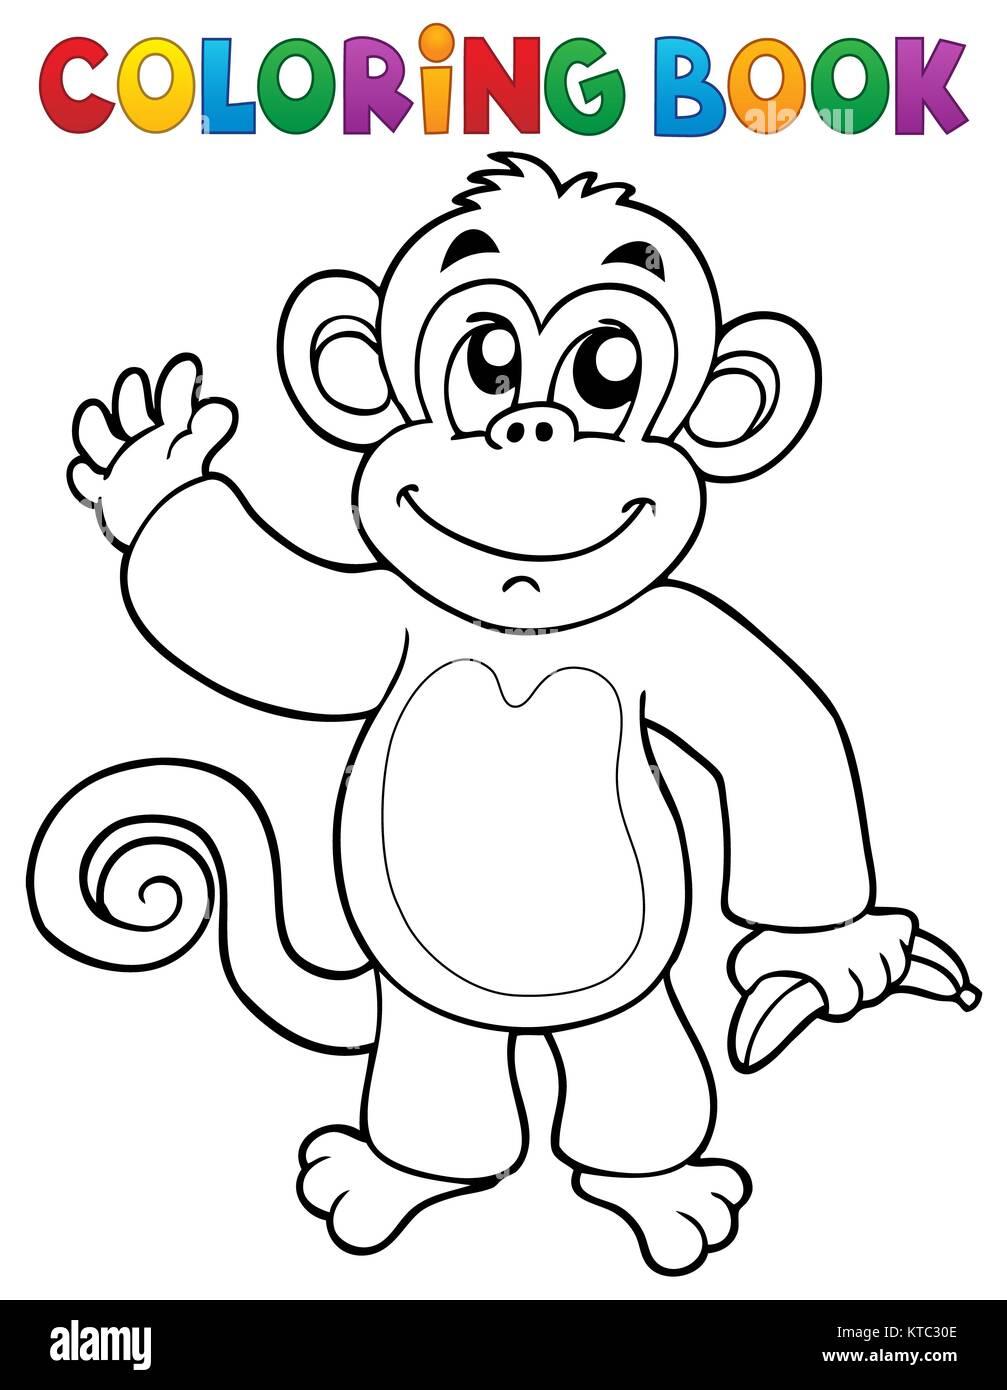 Coloring book monkey theme 3 Stock Photo: 169910846 - Alamy